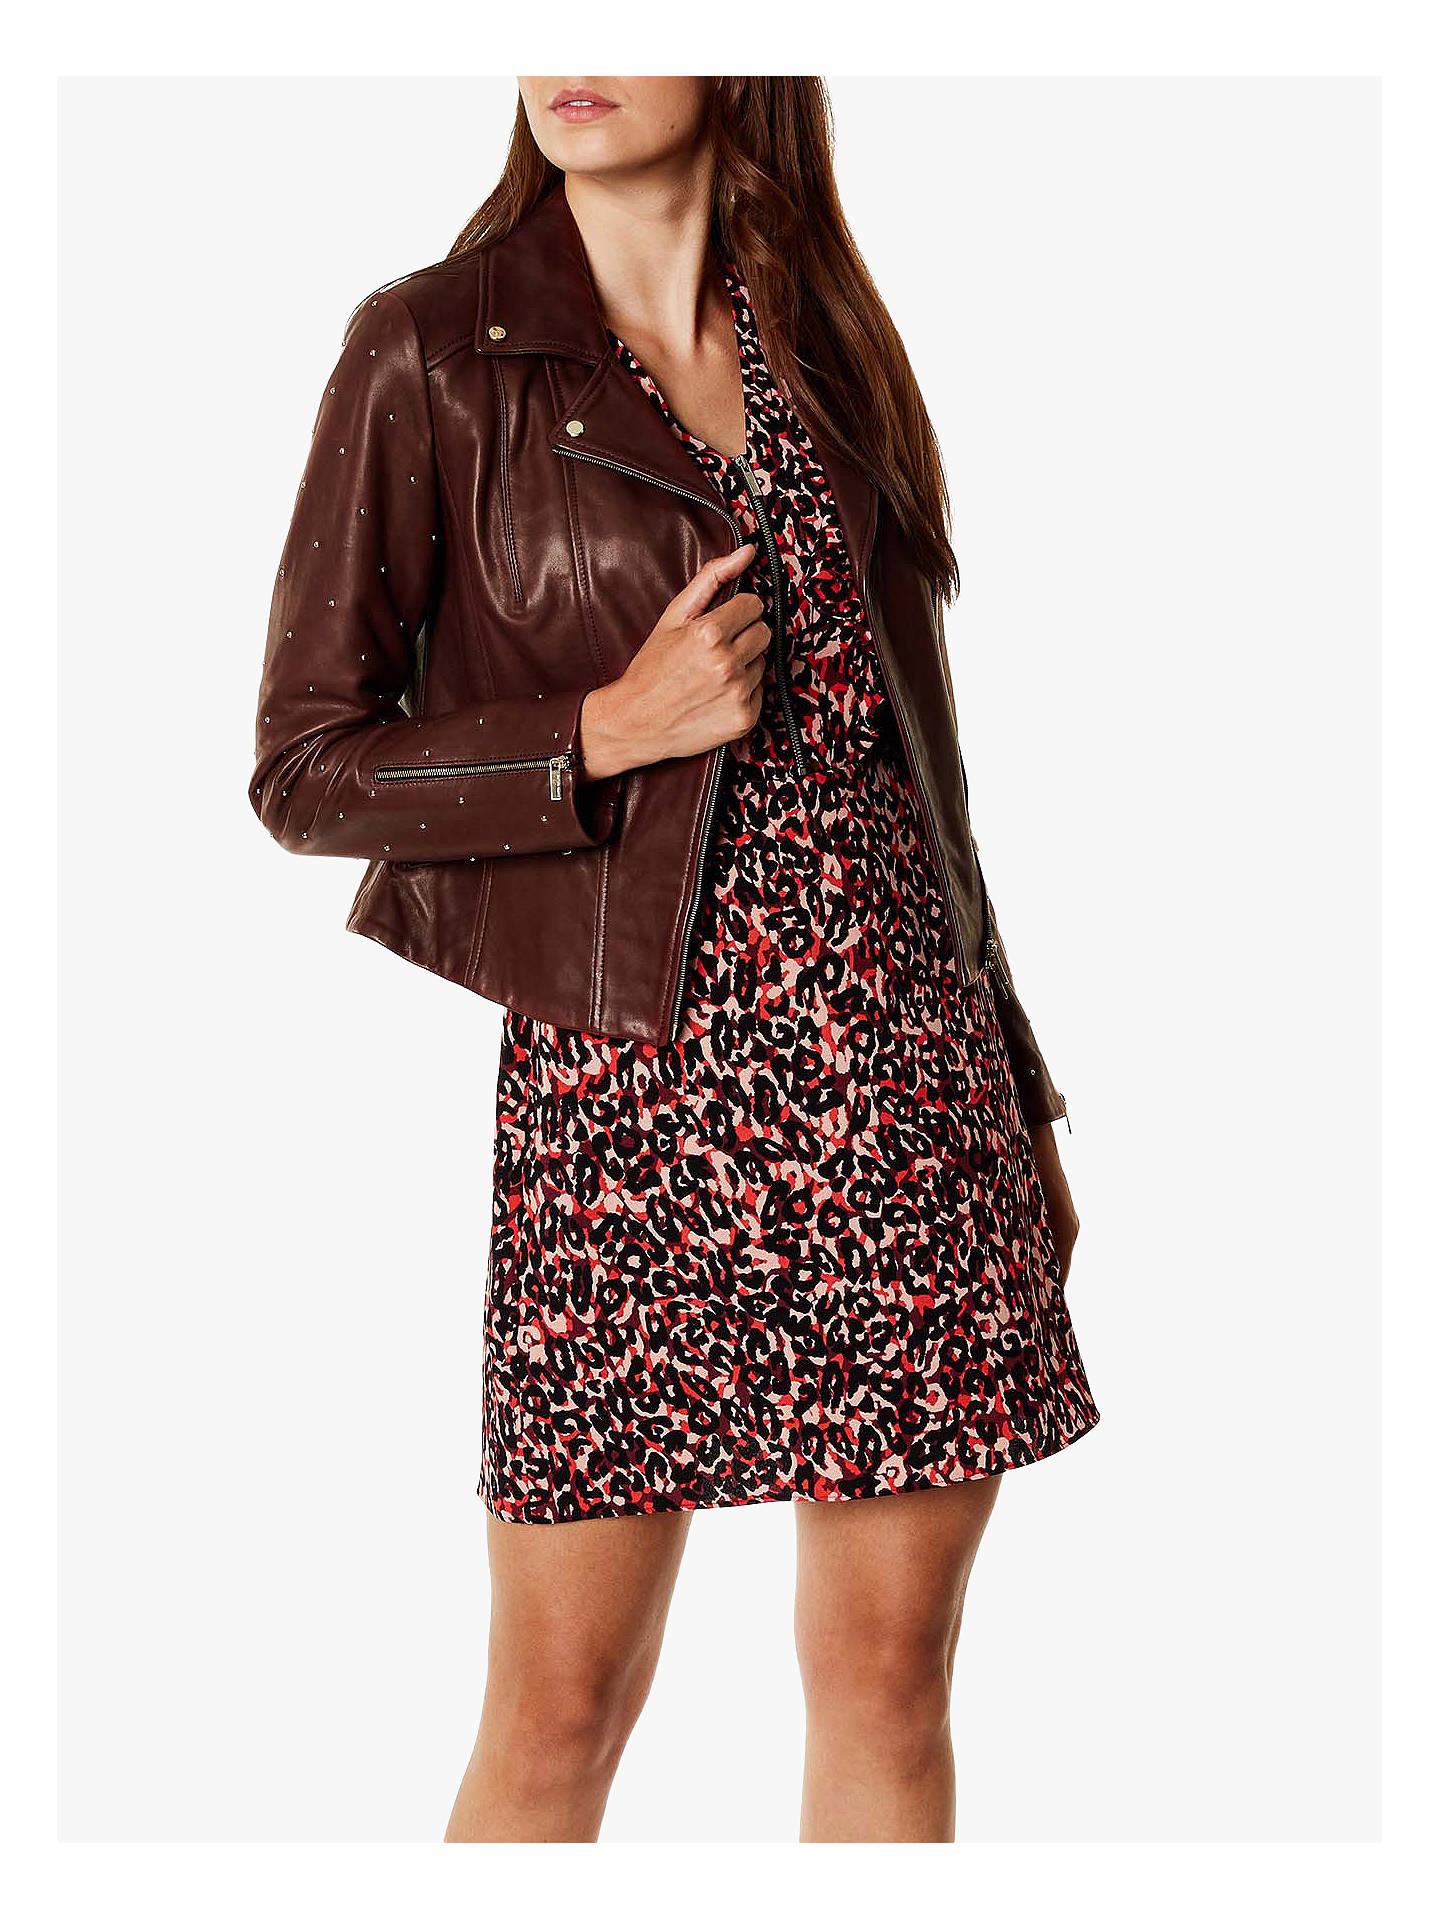 19b070fdb5609 Buy Karen Millen Studded Leather Jacket, Aubergine, 6 Online at  johnlewis.com ...